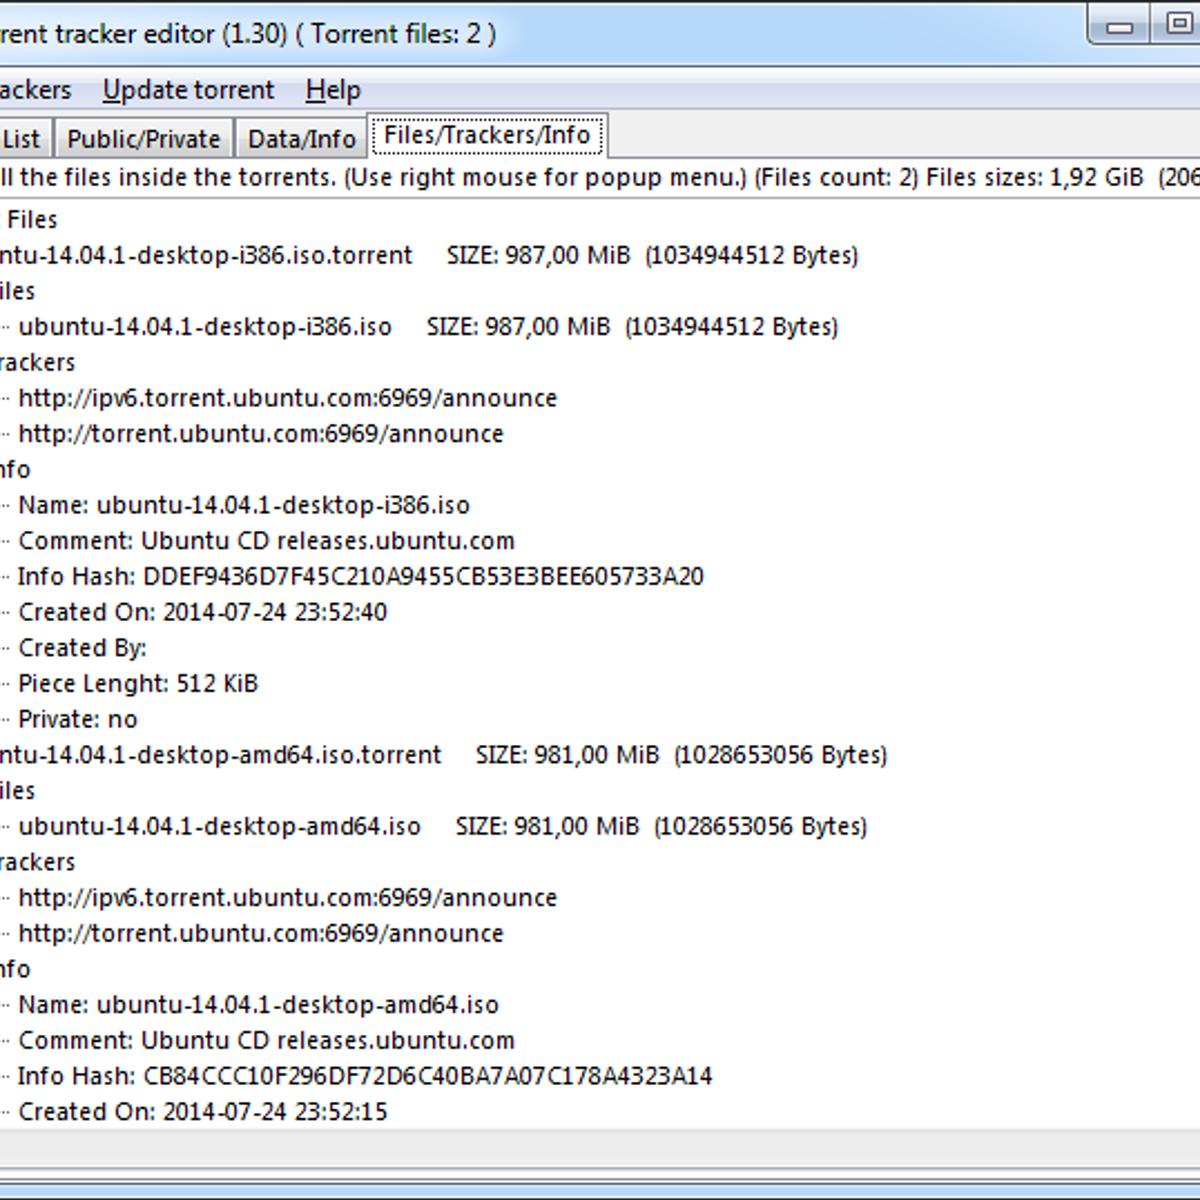 bittorrent tracker editor Alternatives and Similar Software